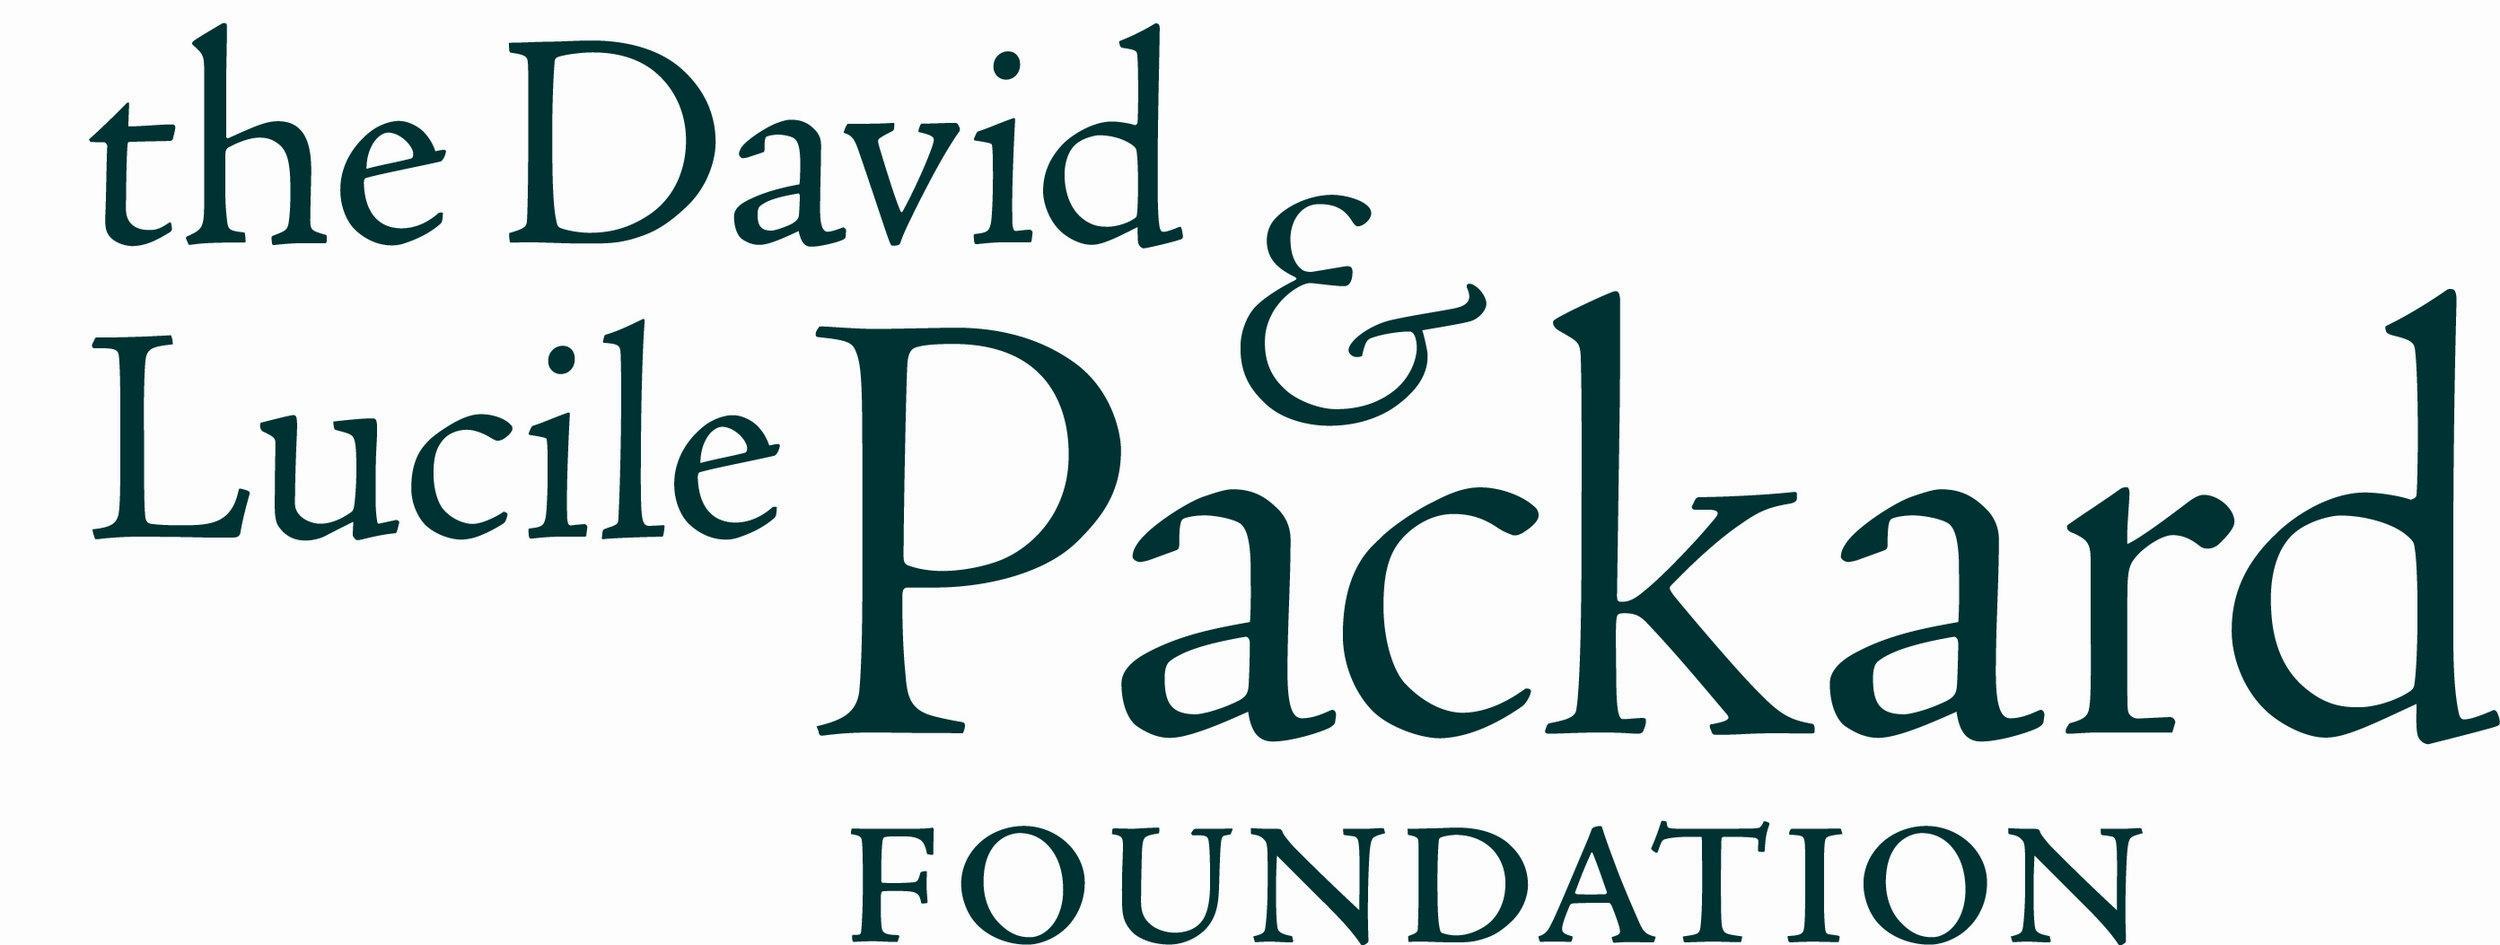 packard stacked logo green PMS 3305.jpg